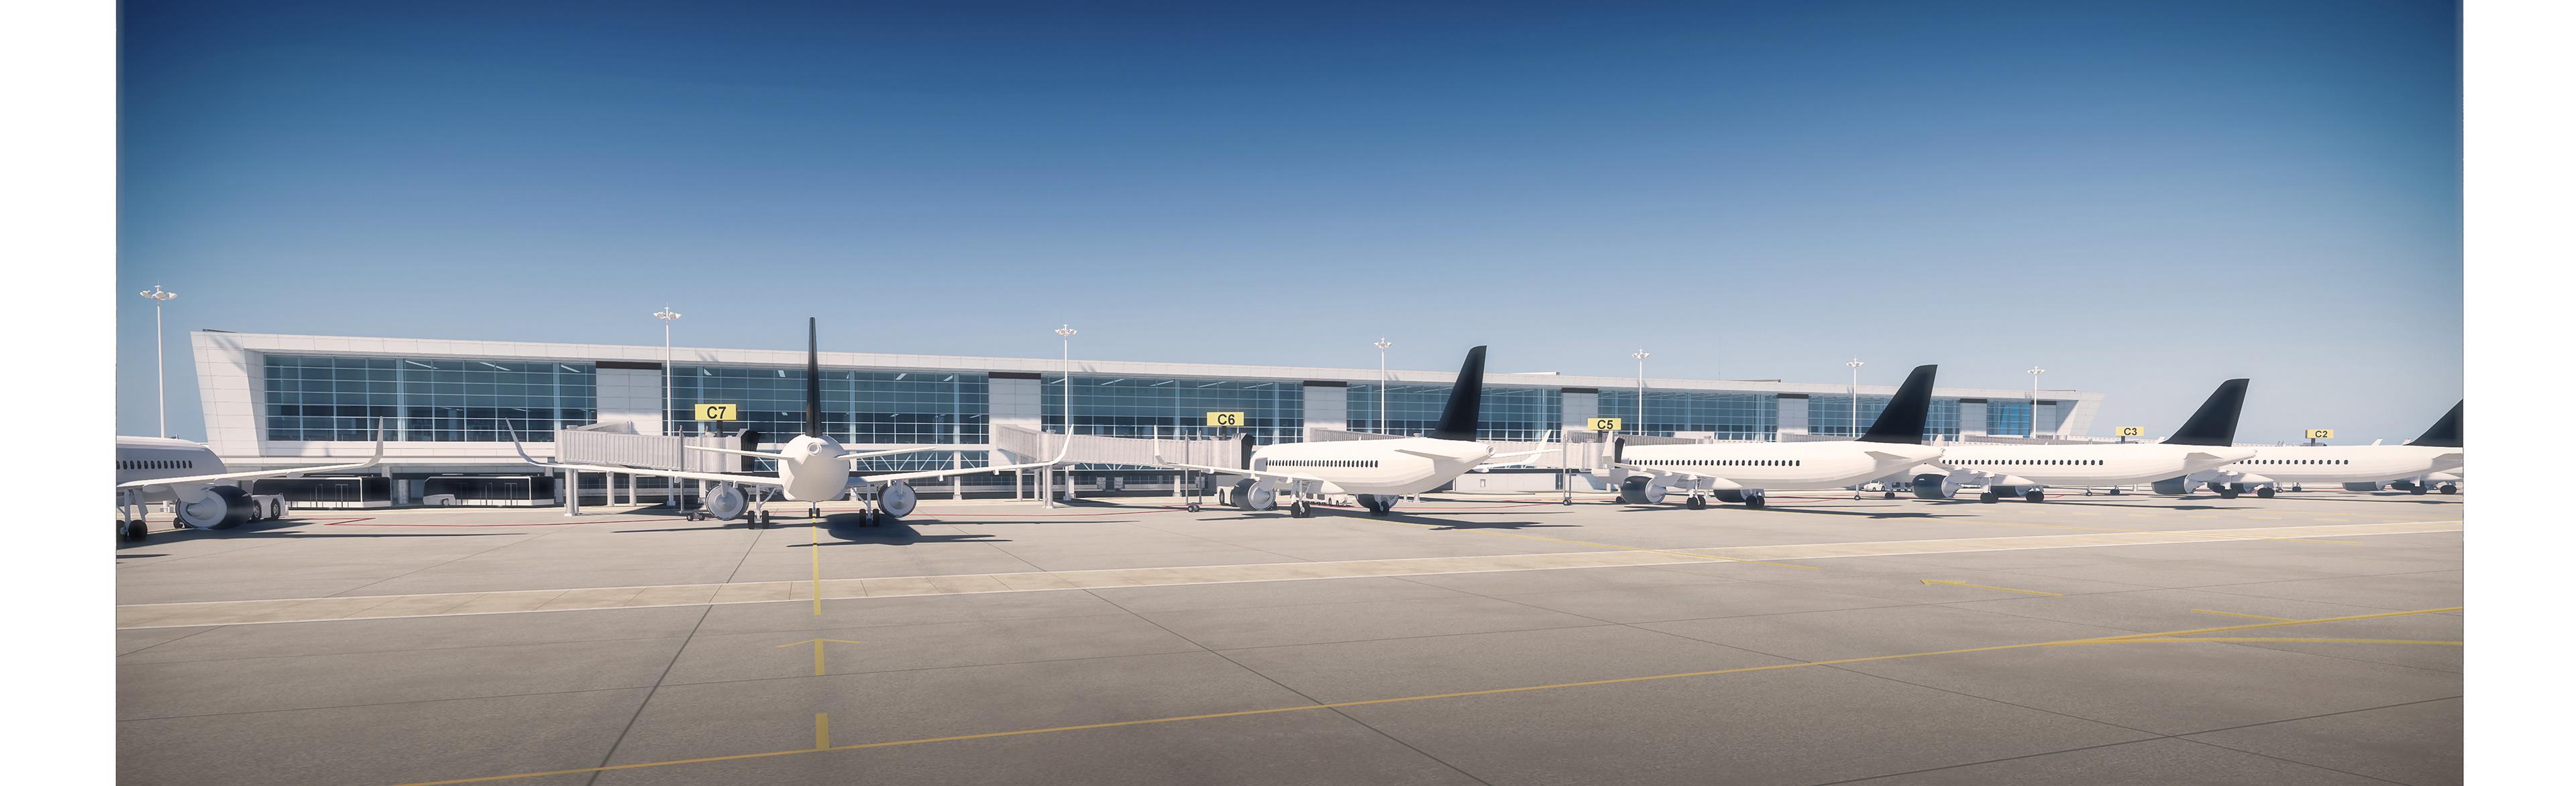 HTT arquitectura - Aeropuerto de Merida